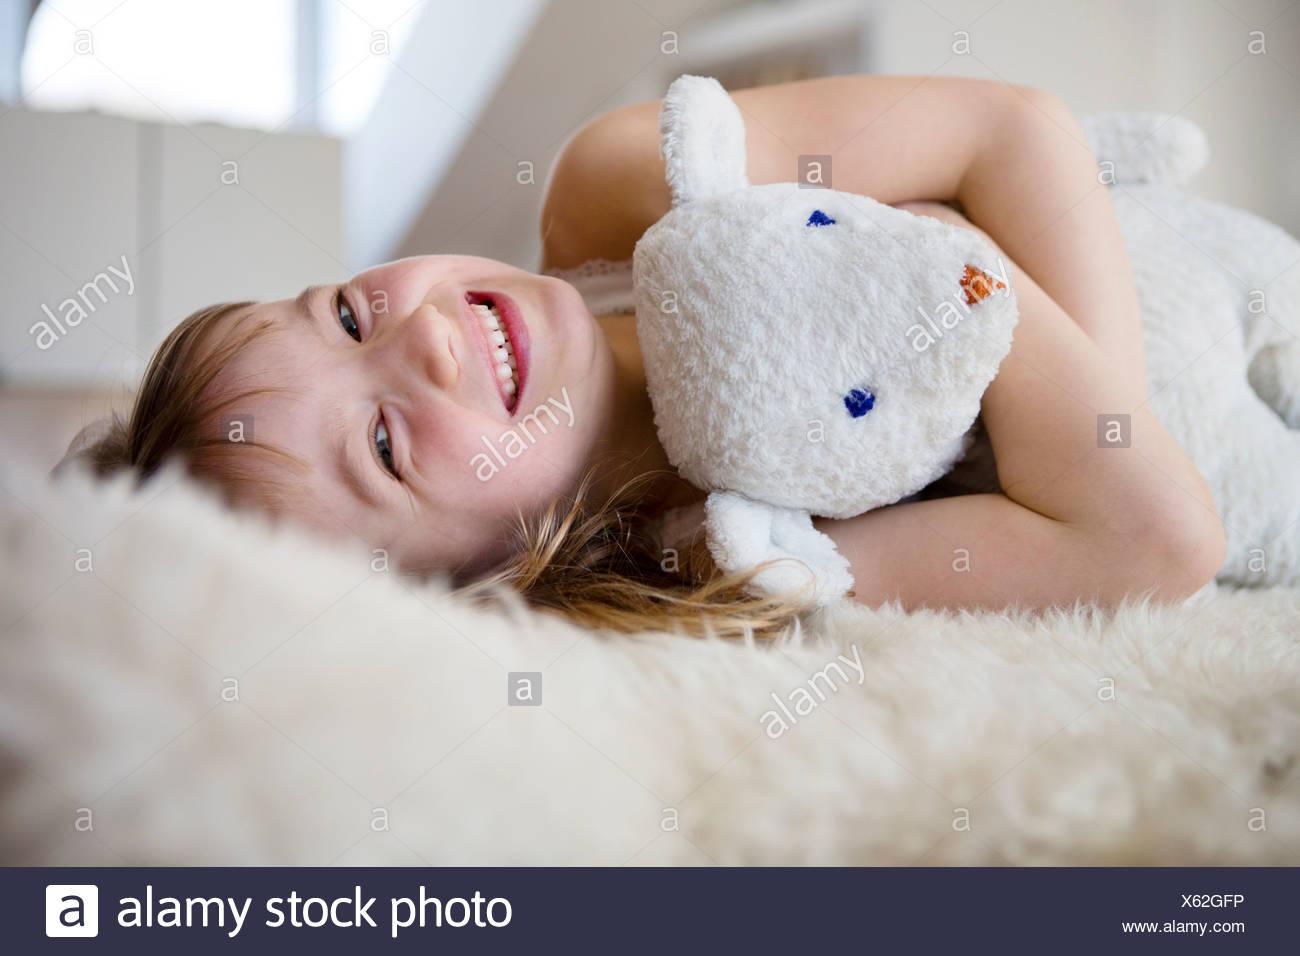 Girl lying on furry bed cuddling teddy bear - Stock Image